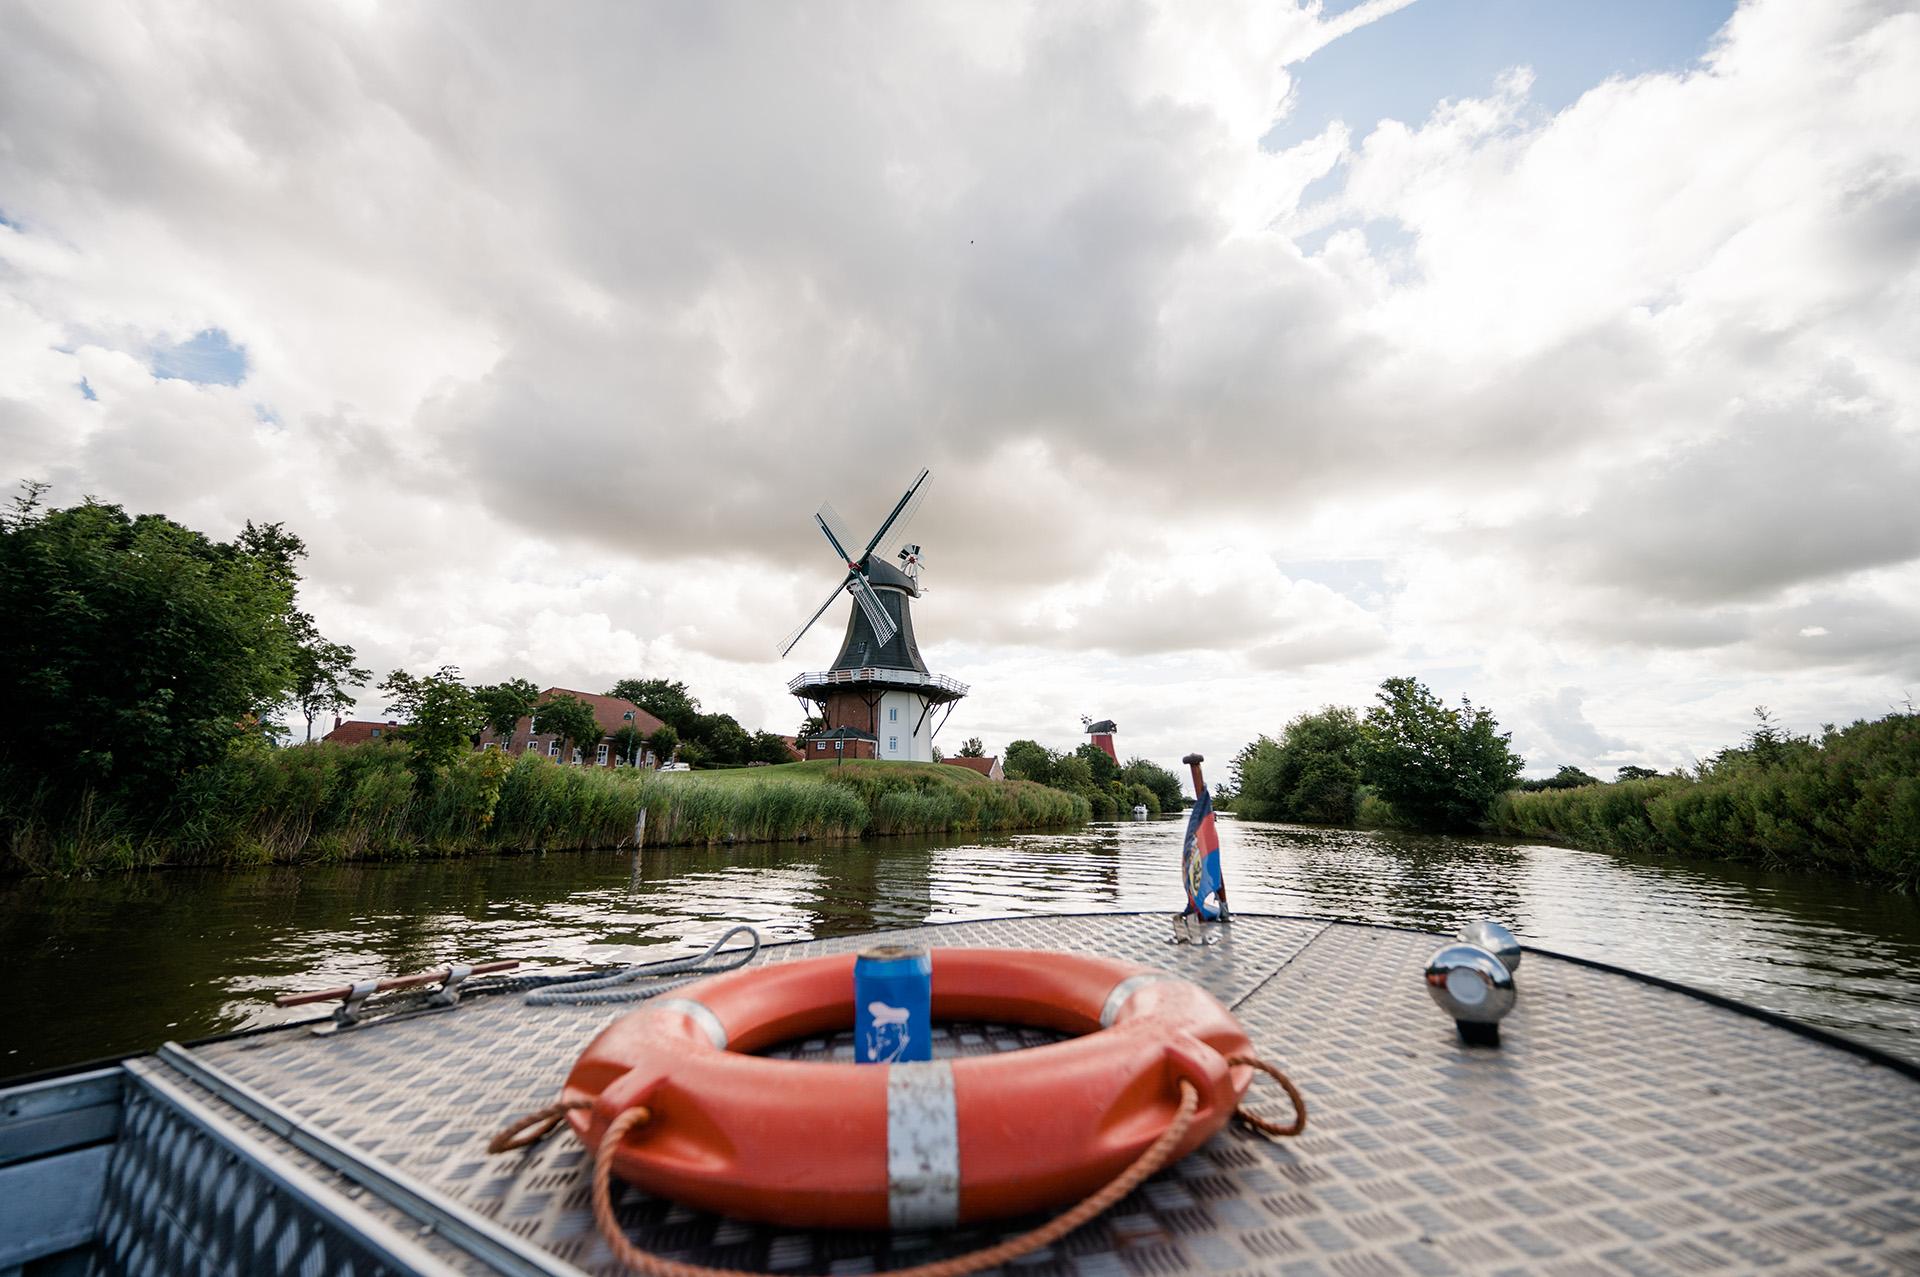 Camping am Deich, Greetsiel, Zwillingmühlen, Kanal-Bootsfahrt